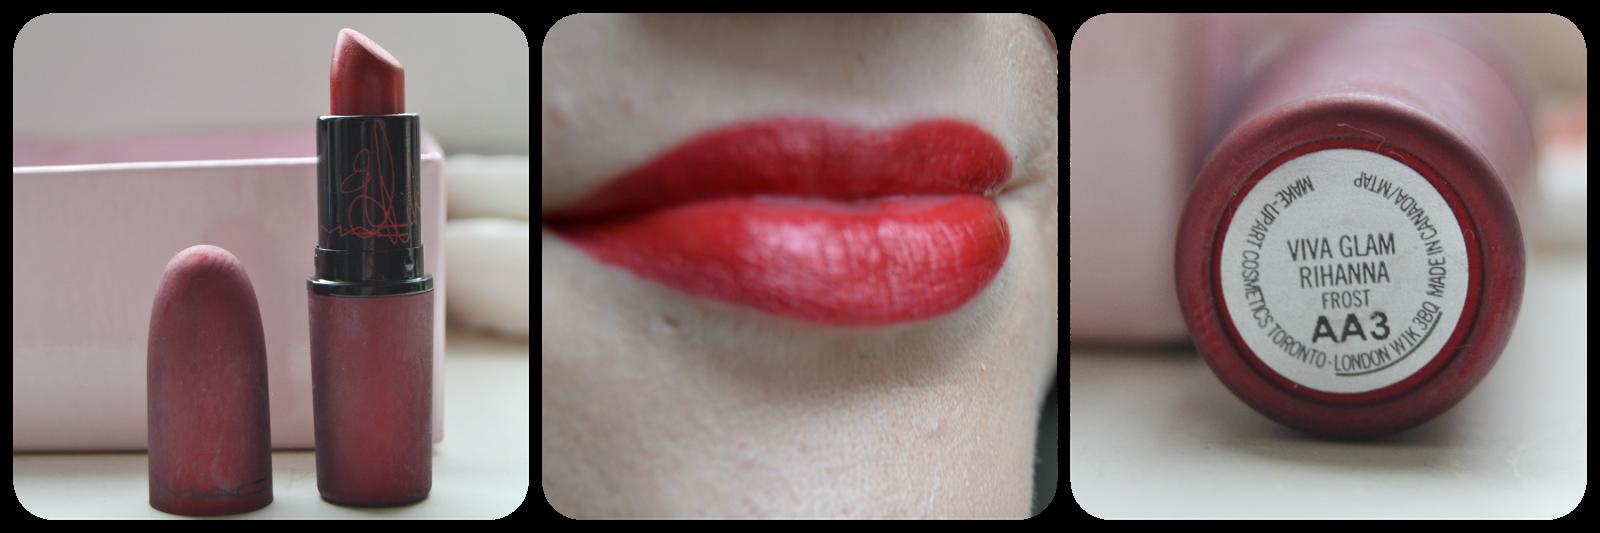 Mac, Cosmetics, Lipstick, Lippenstift, Swatch, Viva Glam Rihanna I, Lipswatch, Swatches, Frost